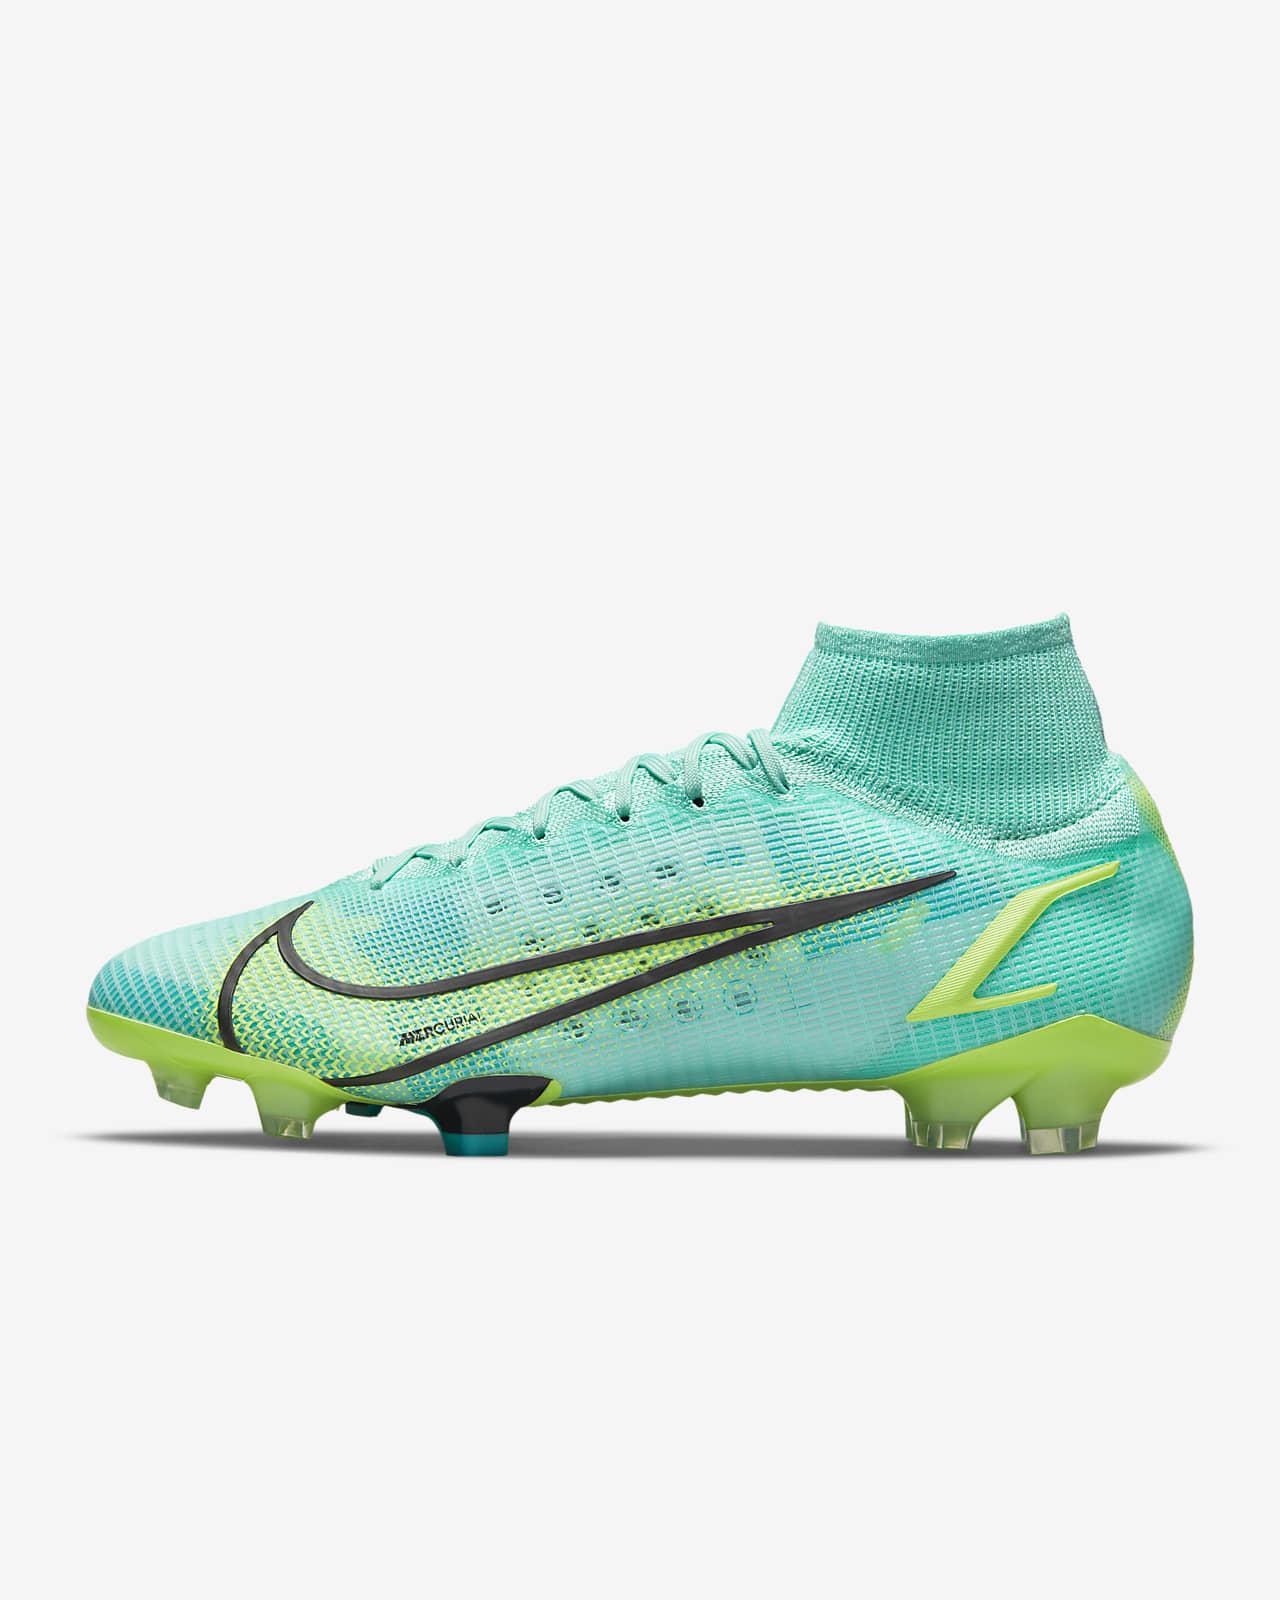 Calzado de fútbol para terreno firme Nike Mercurial Superfly 8 Elite FG